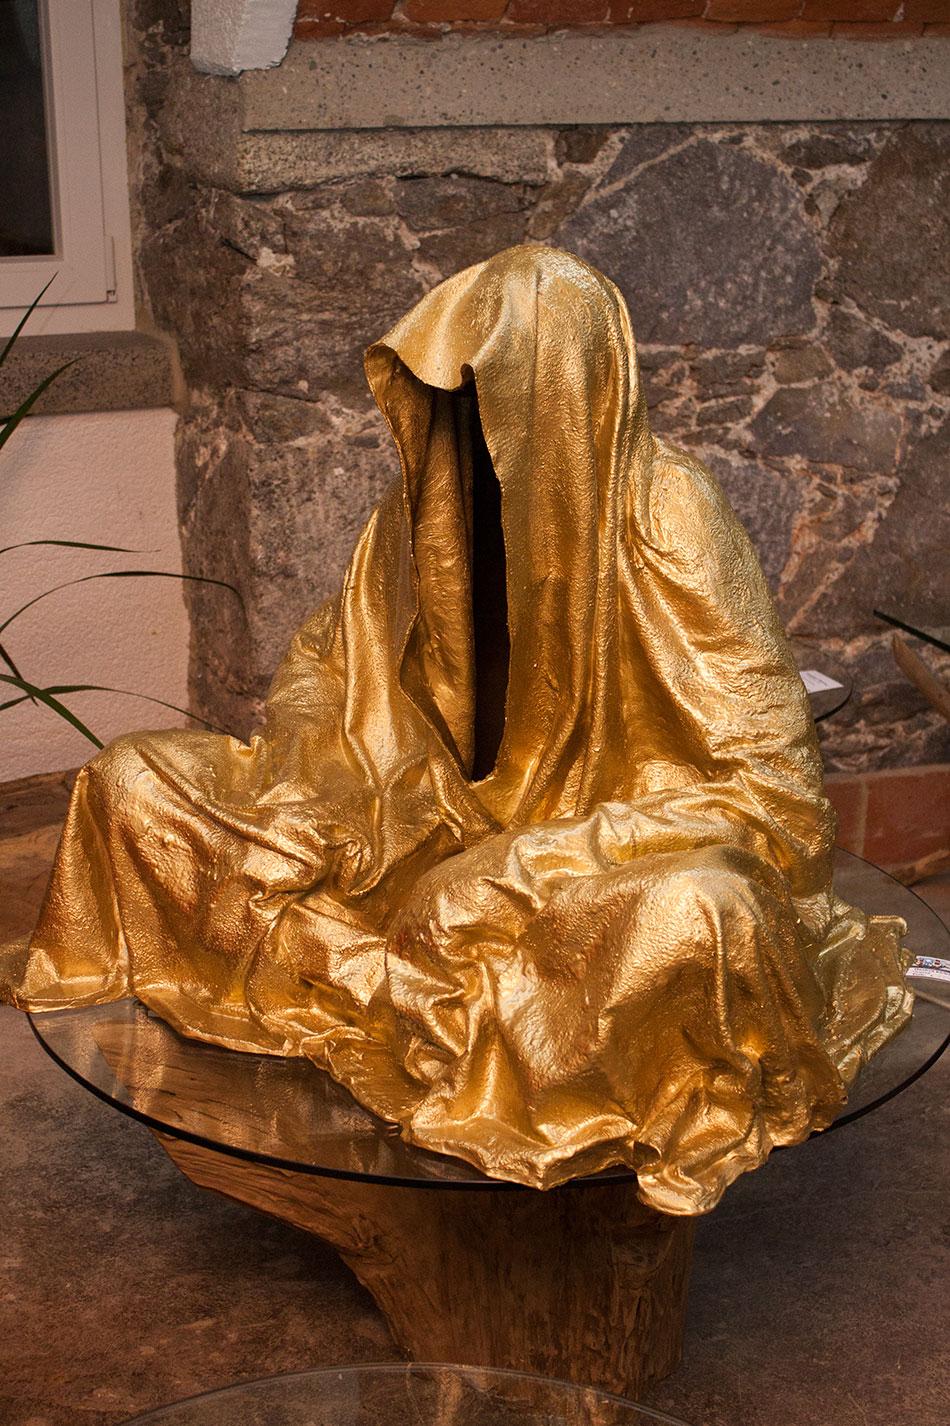 mobile-galerie-gall-toko06-linz-25er-turm-guardians-of-time-manfred-kielnhofer-contemporary-fine-art-design-sculpture-2661